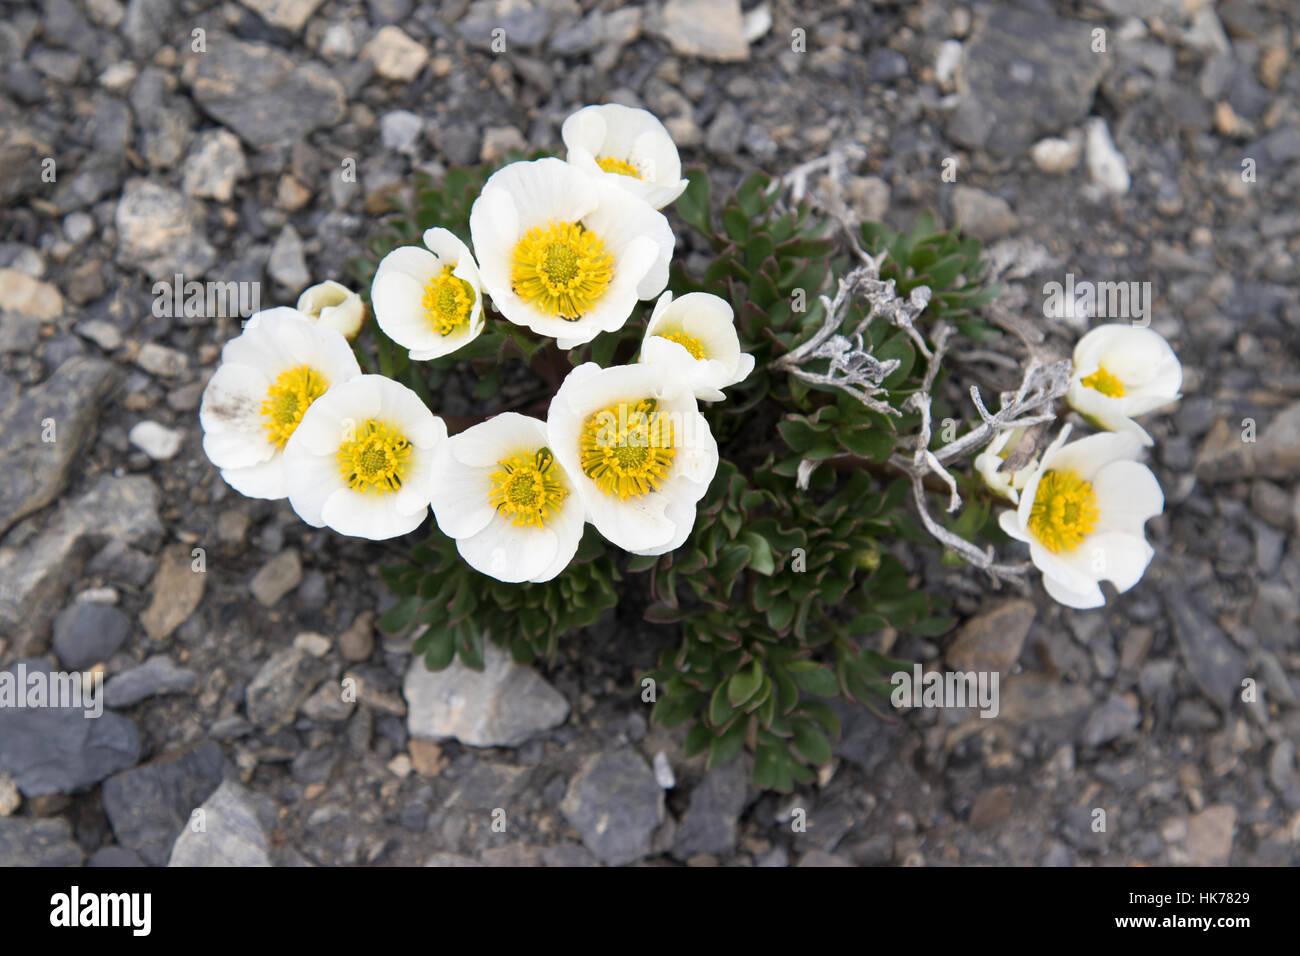 Glacier Crowfoot (Ranunculus glacialis) flowers - Stock Image